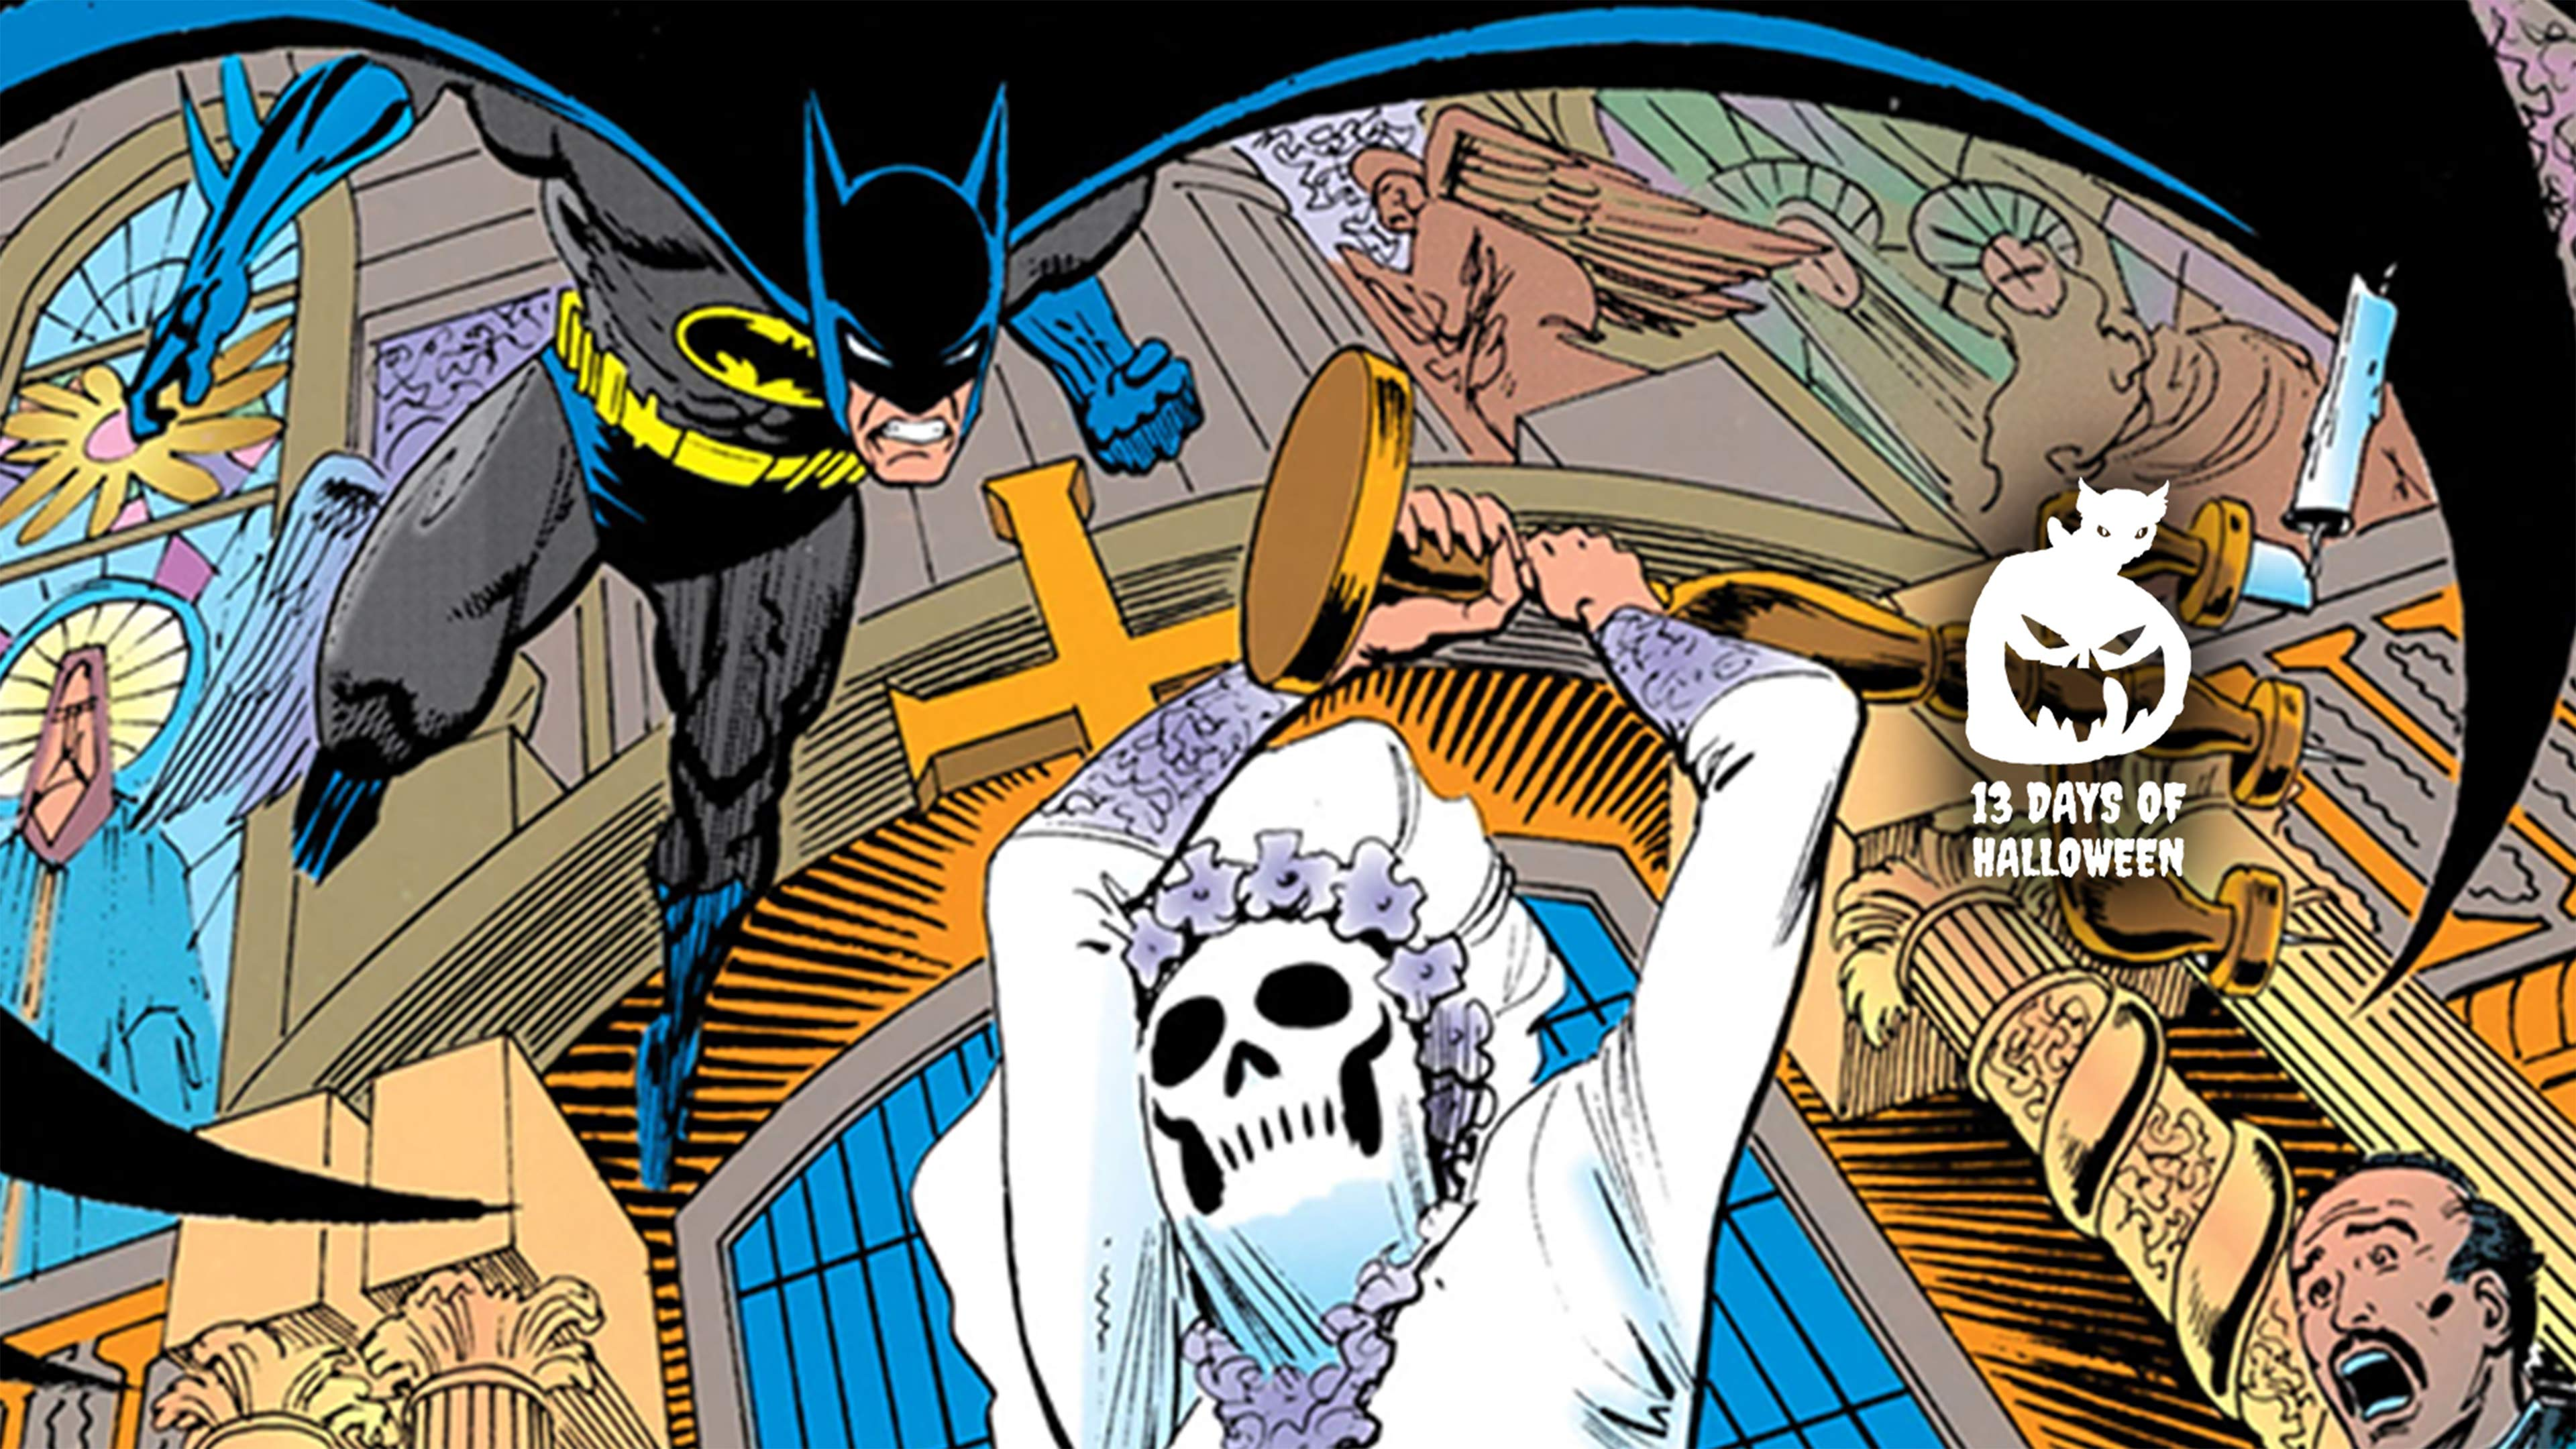 13daysofhalloween-batmanmasteroffear_news_hero-c_v1_191025.jpg